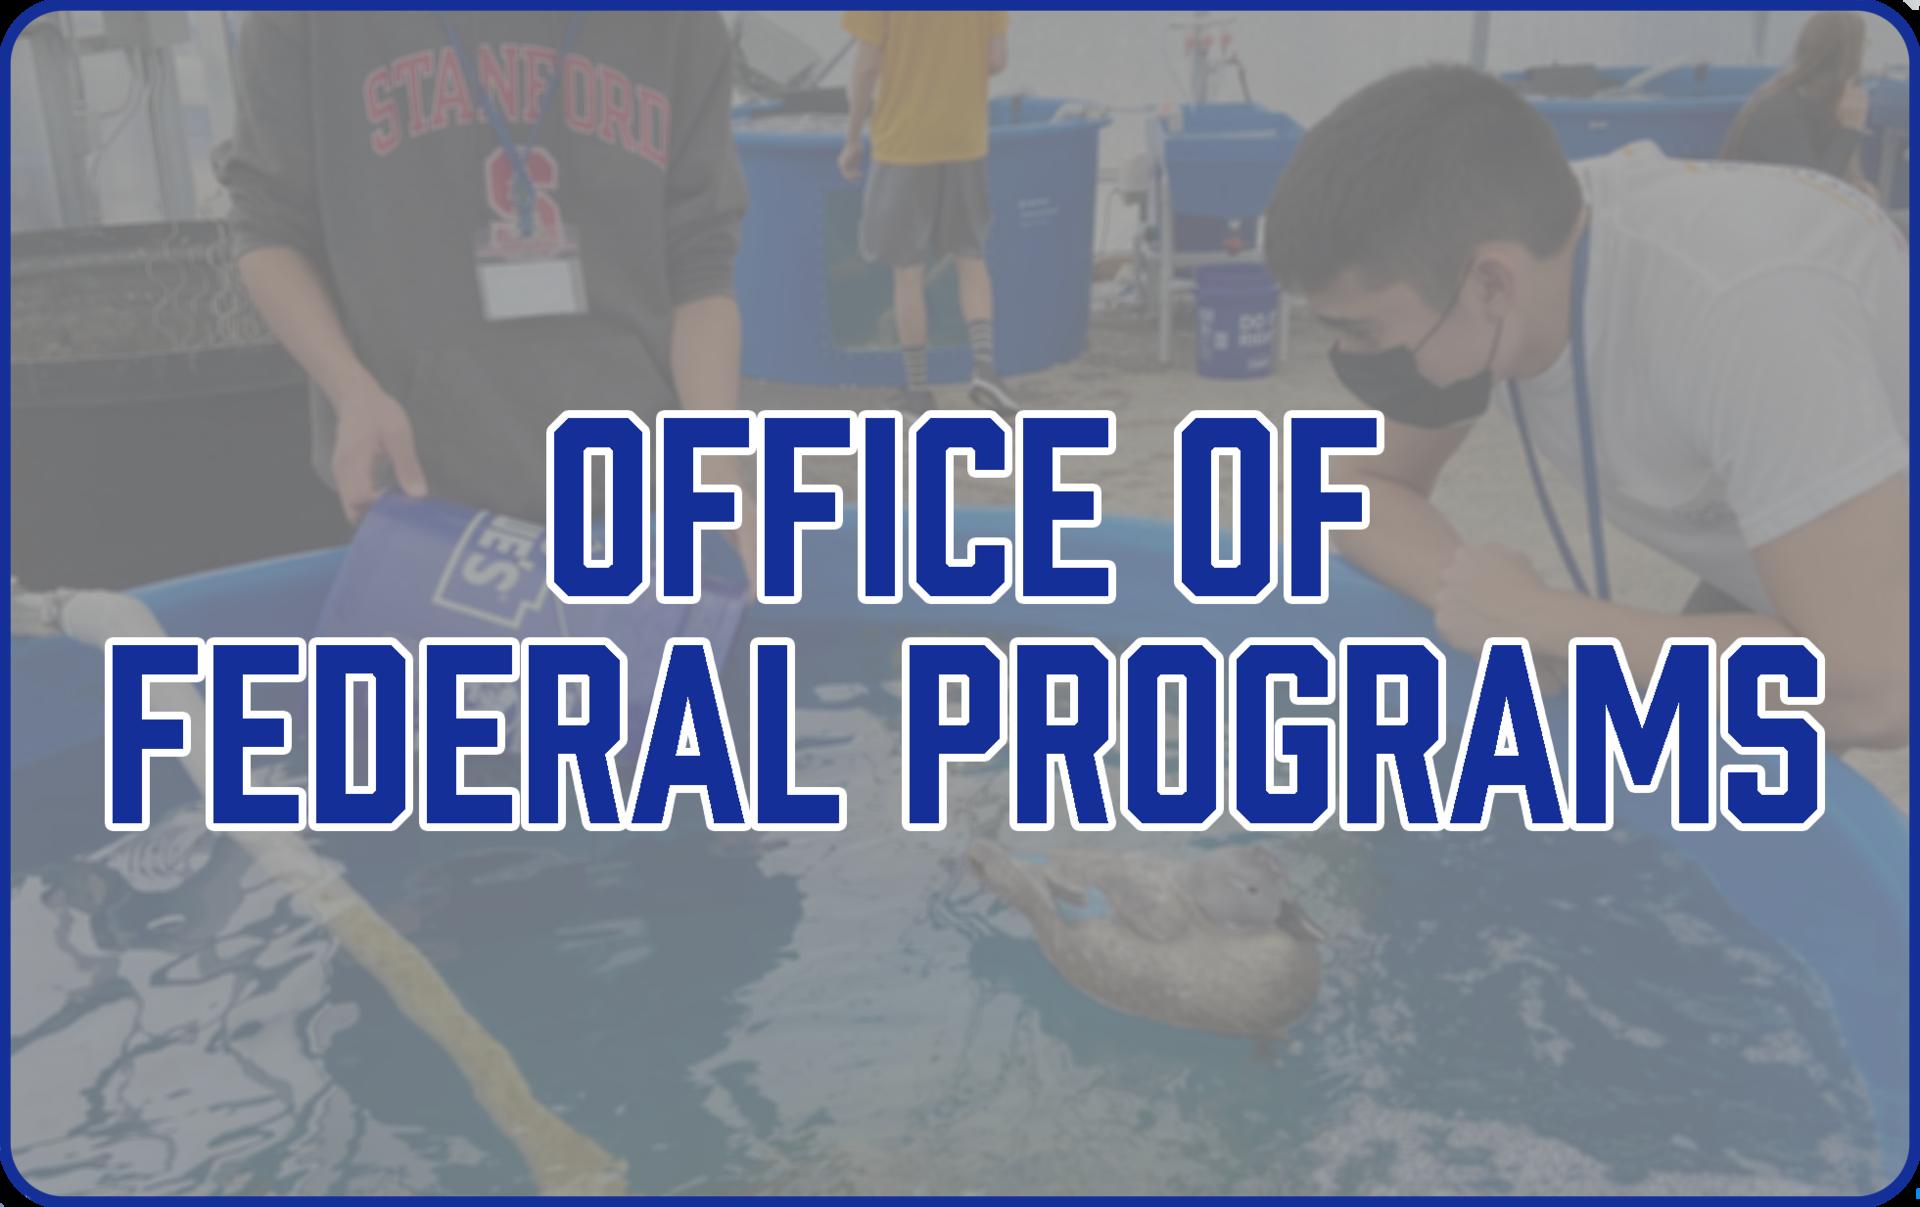 Federal Programs Icon